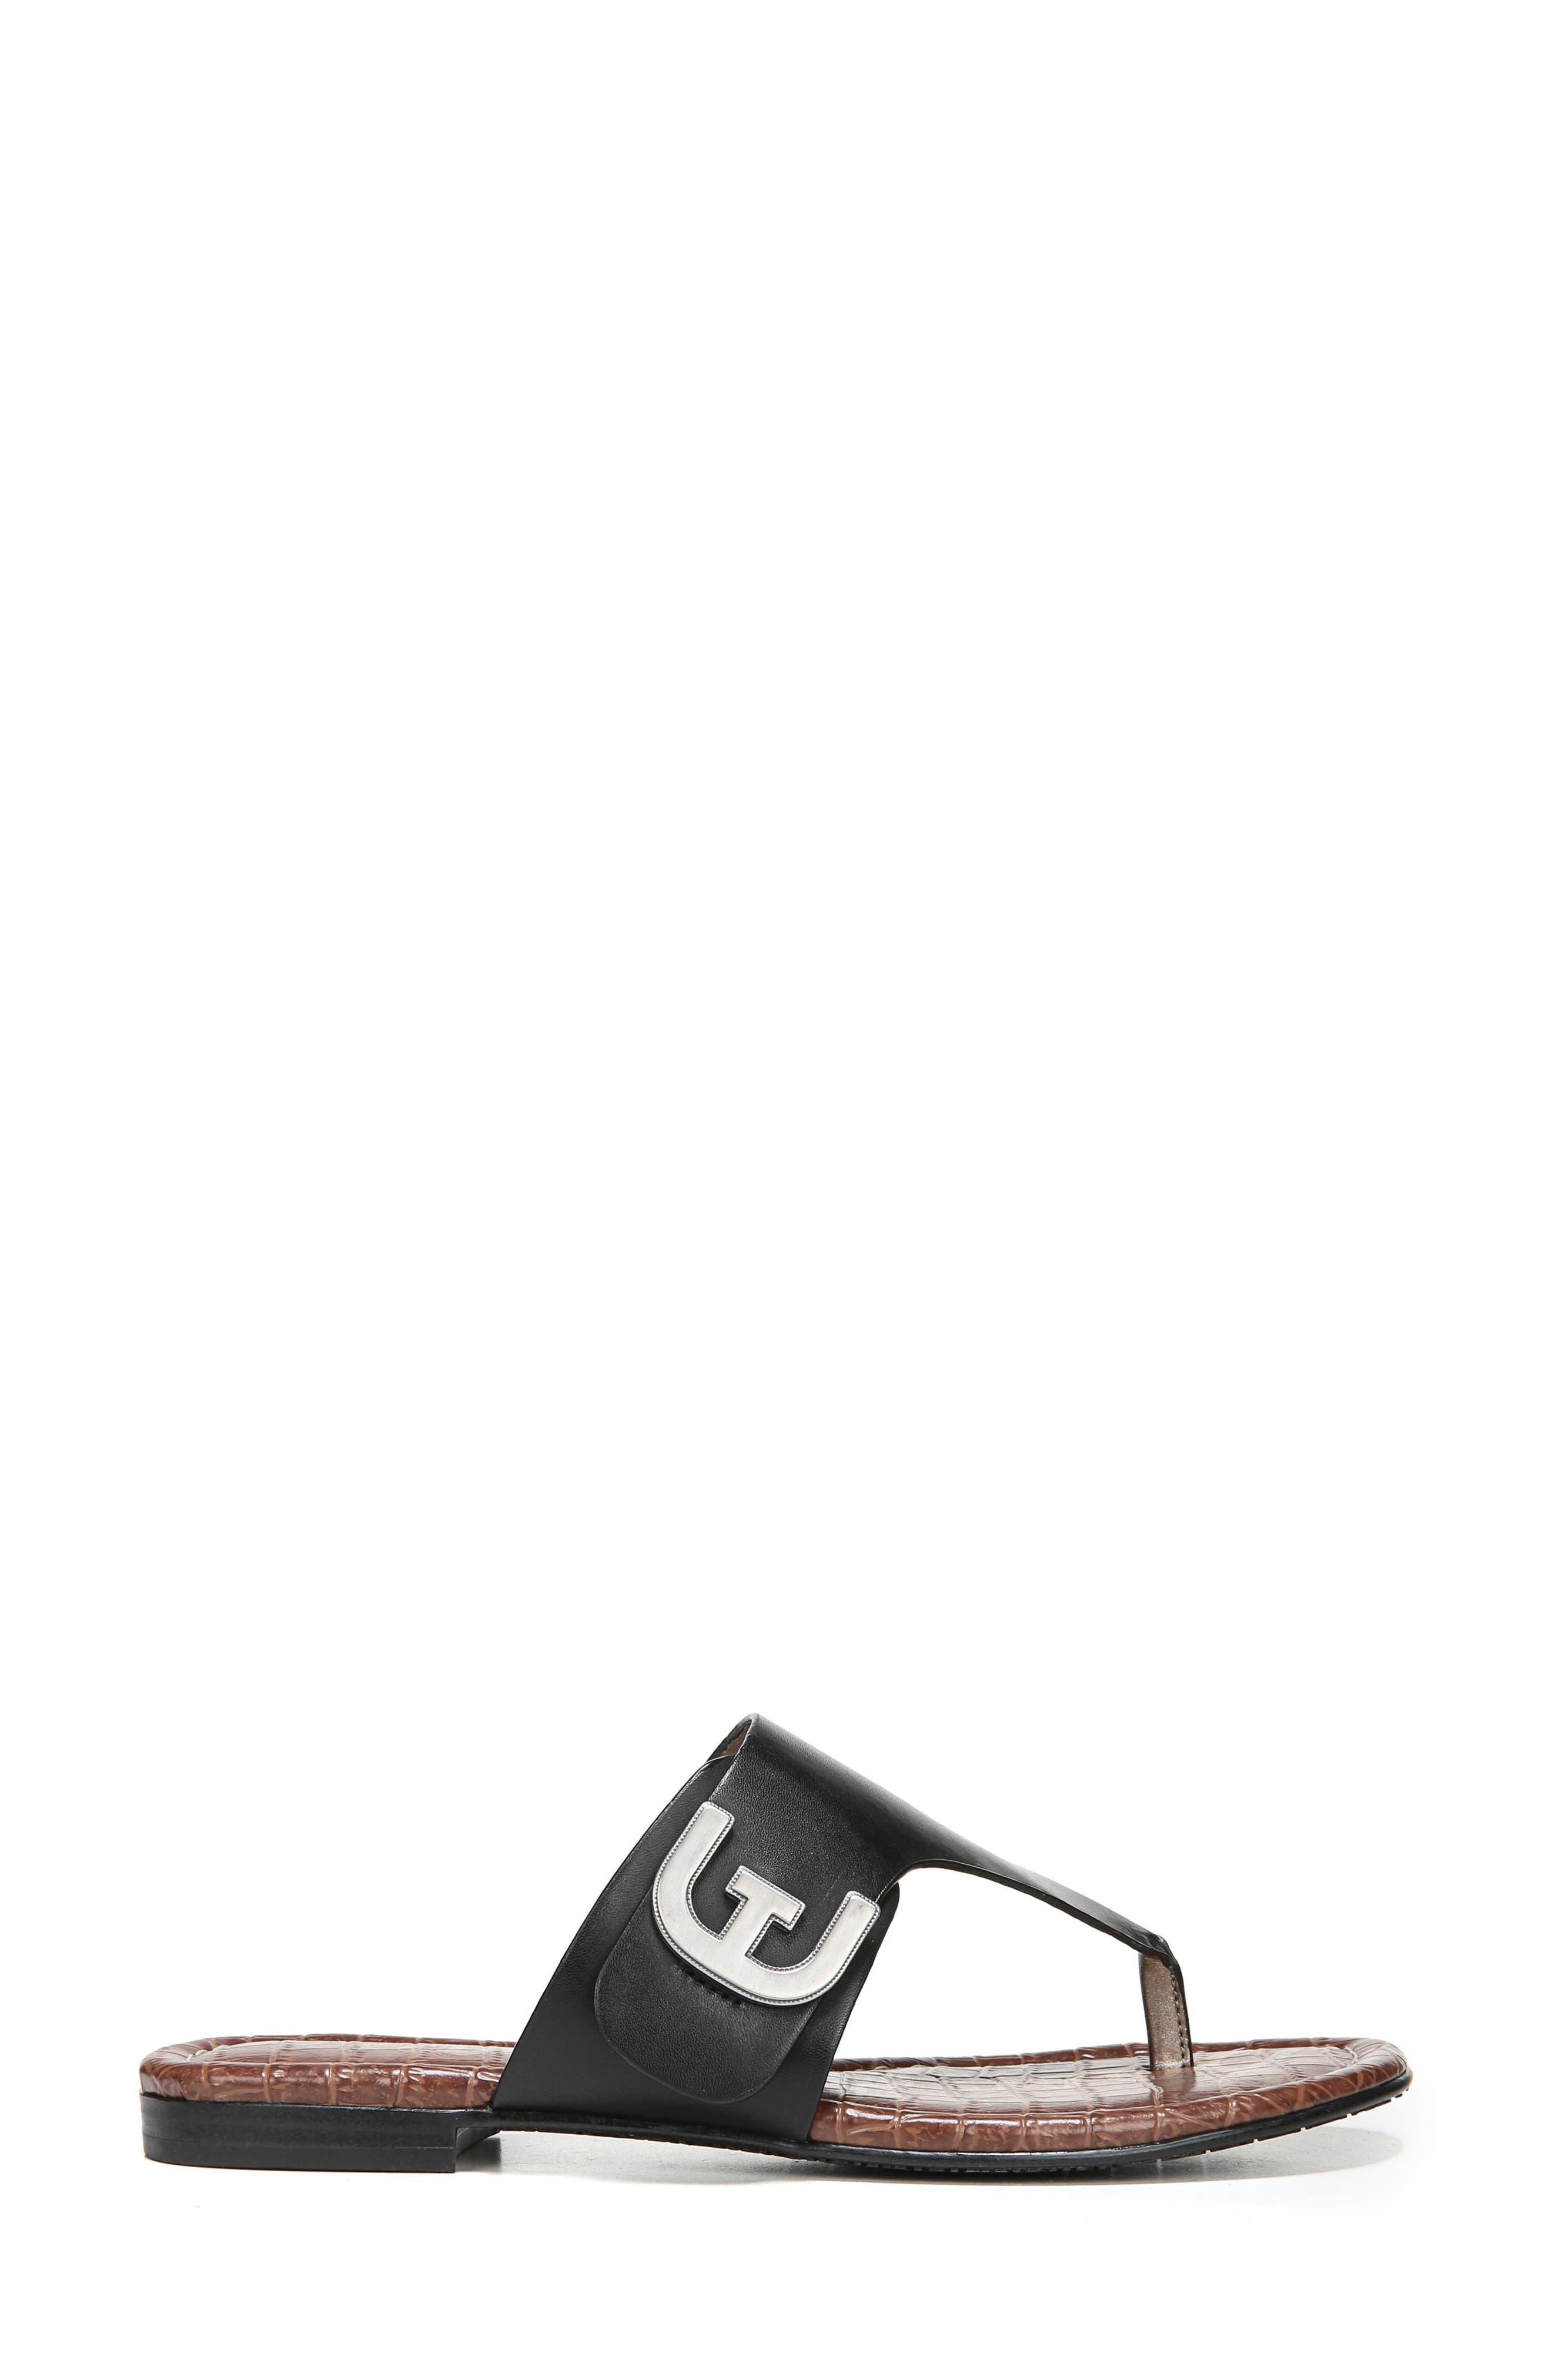 Barry V-Strap Thong Sandal,                             Alternate thumbnail 3, color,                             Black Leather